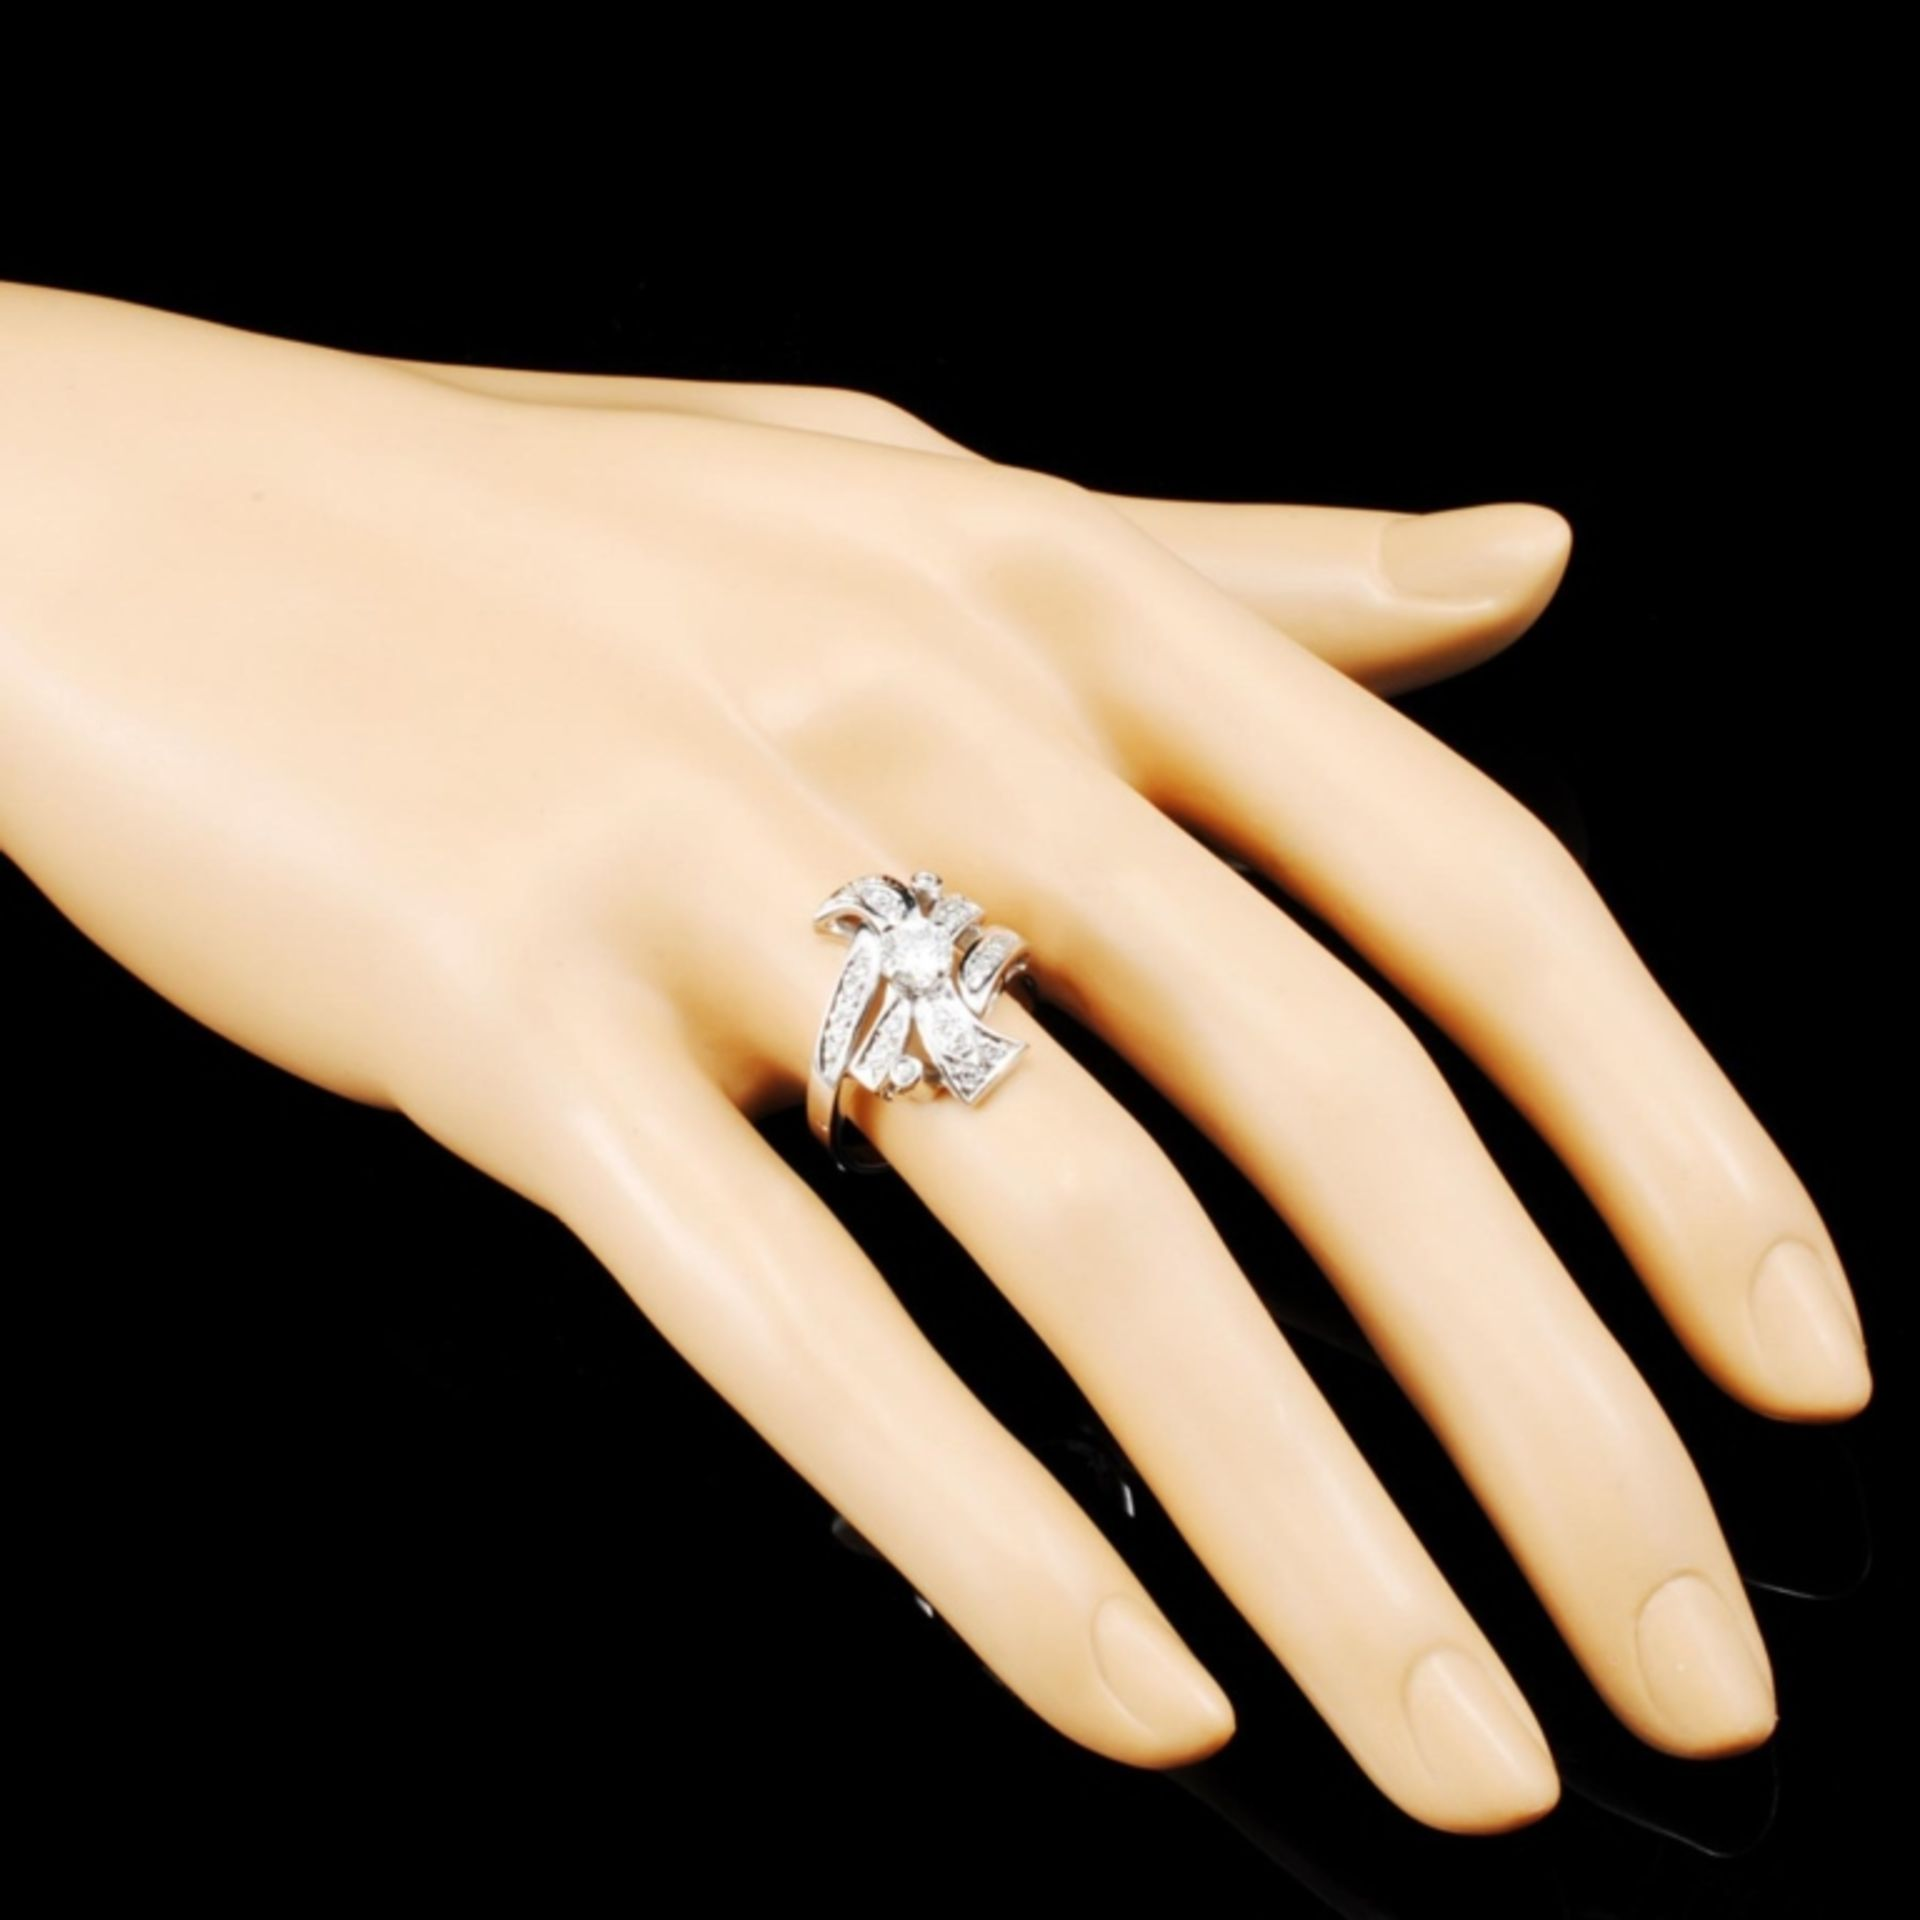 14K Gold 0.85ctw Diamond Ring - Image 3 of 5